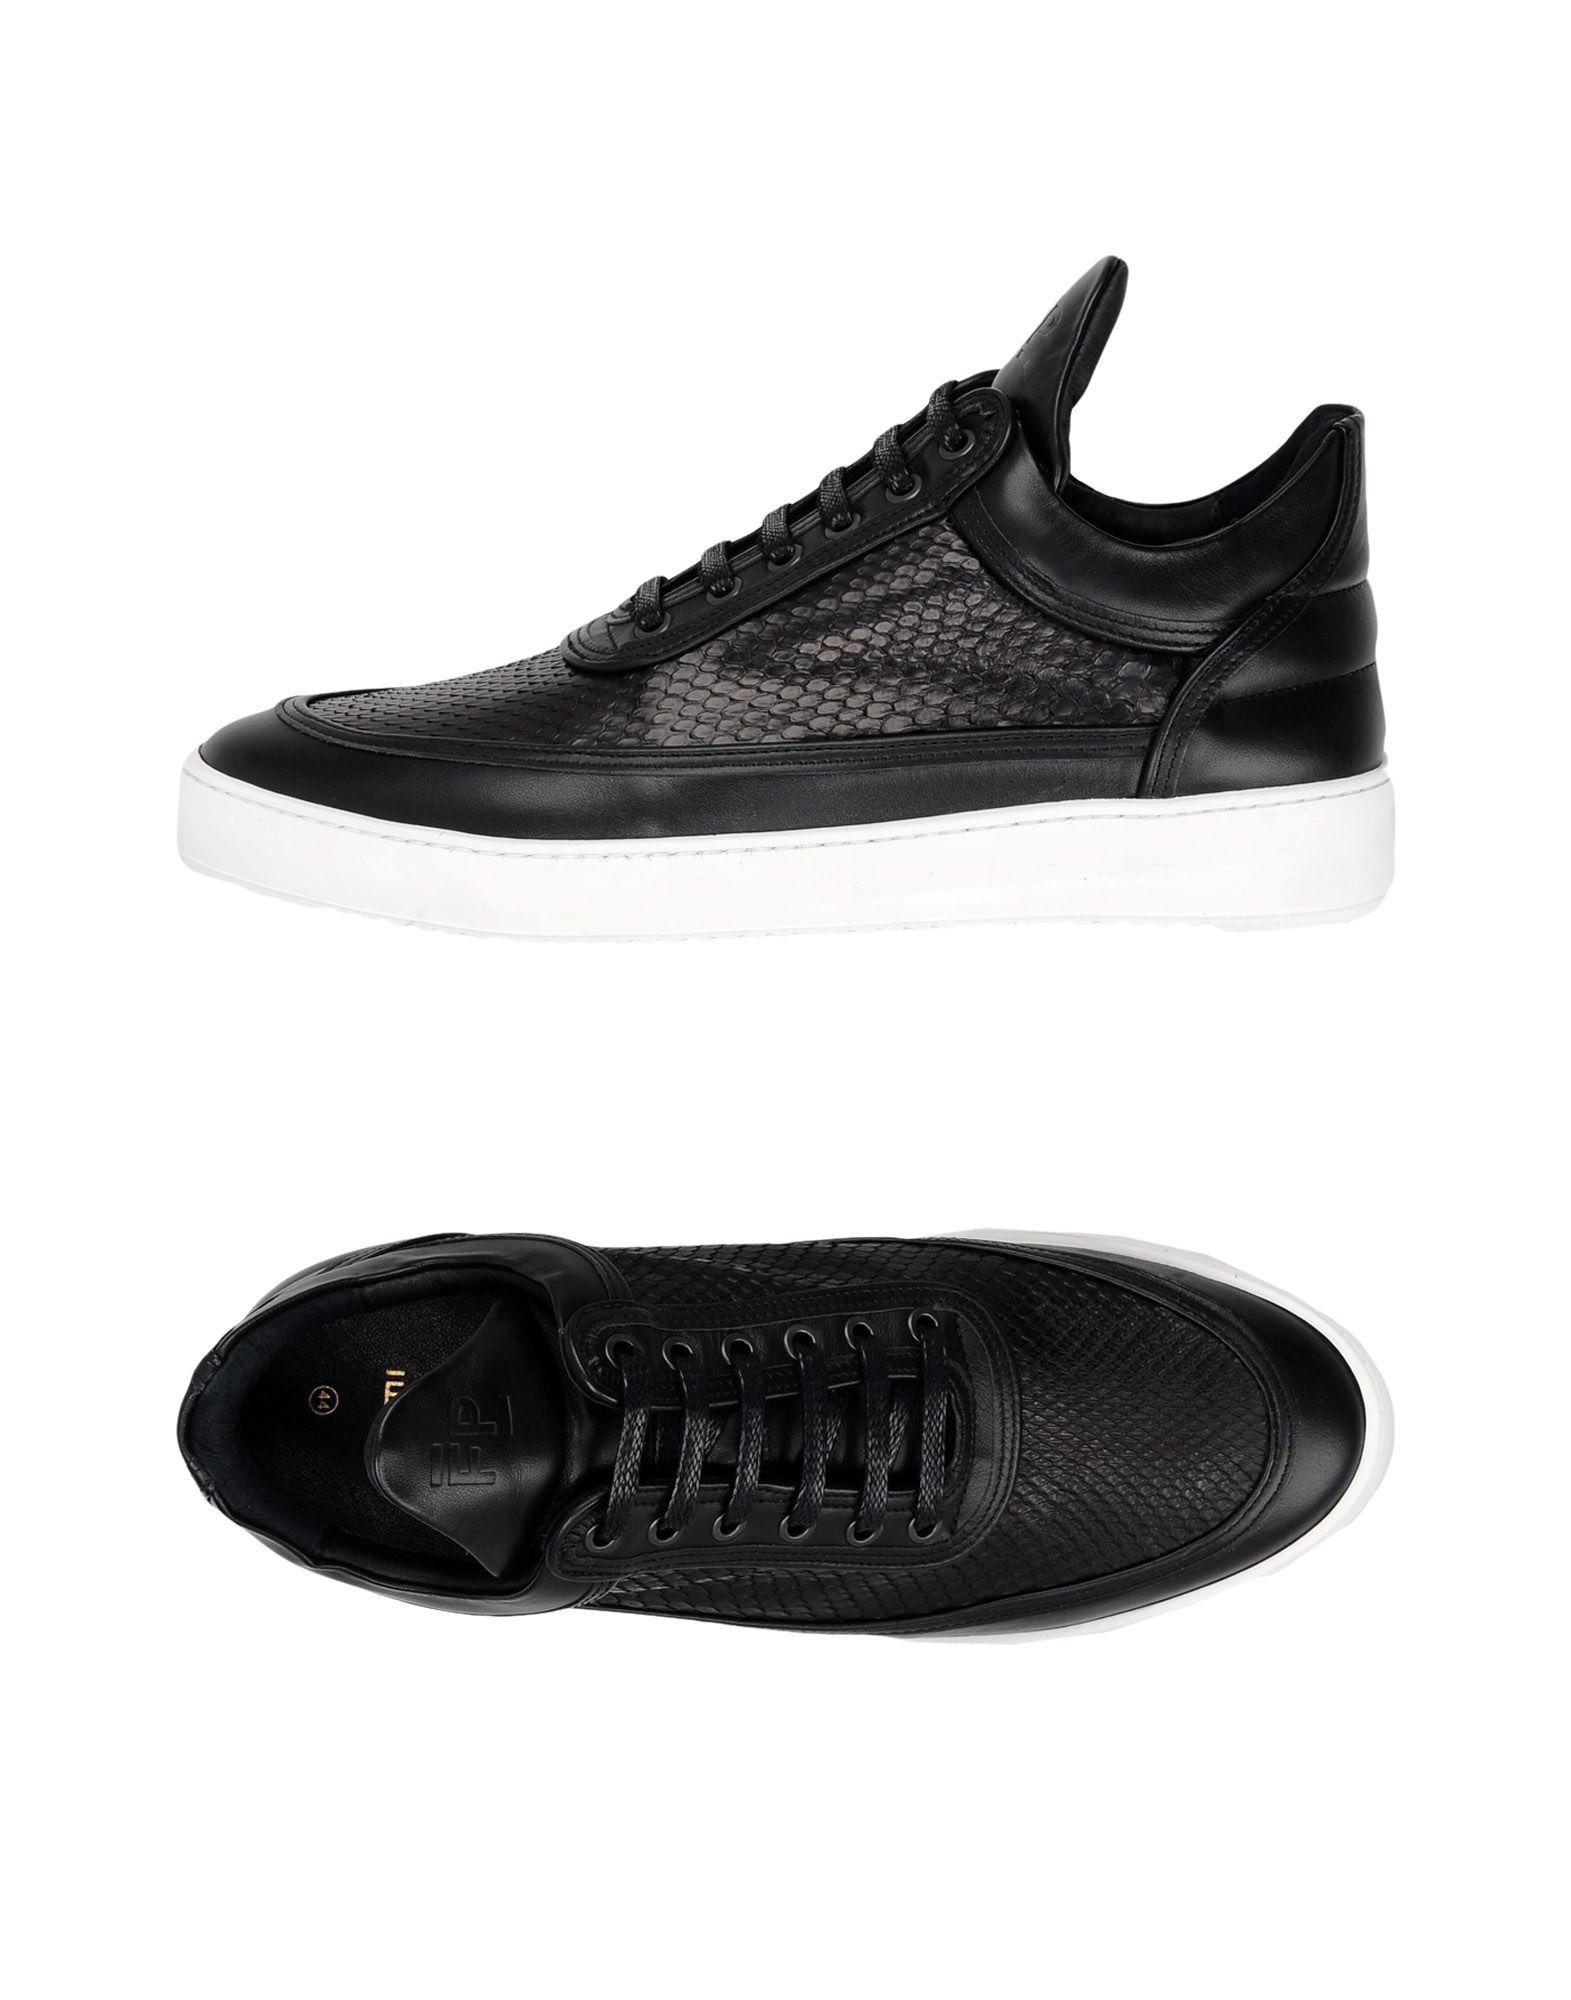 Filling Pieces Low Top Ripple Python Black  11441824JJ Gute Qualität beliebte Schuhe